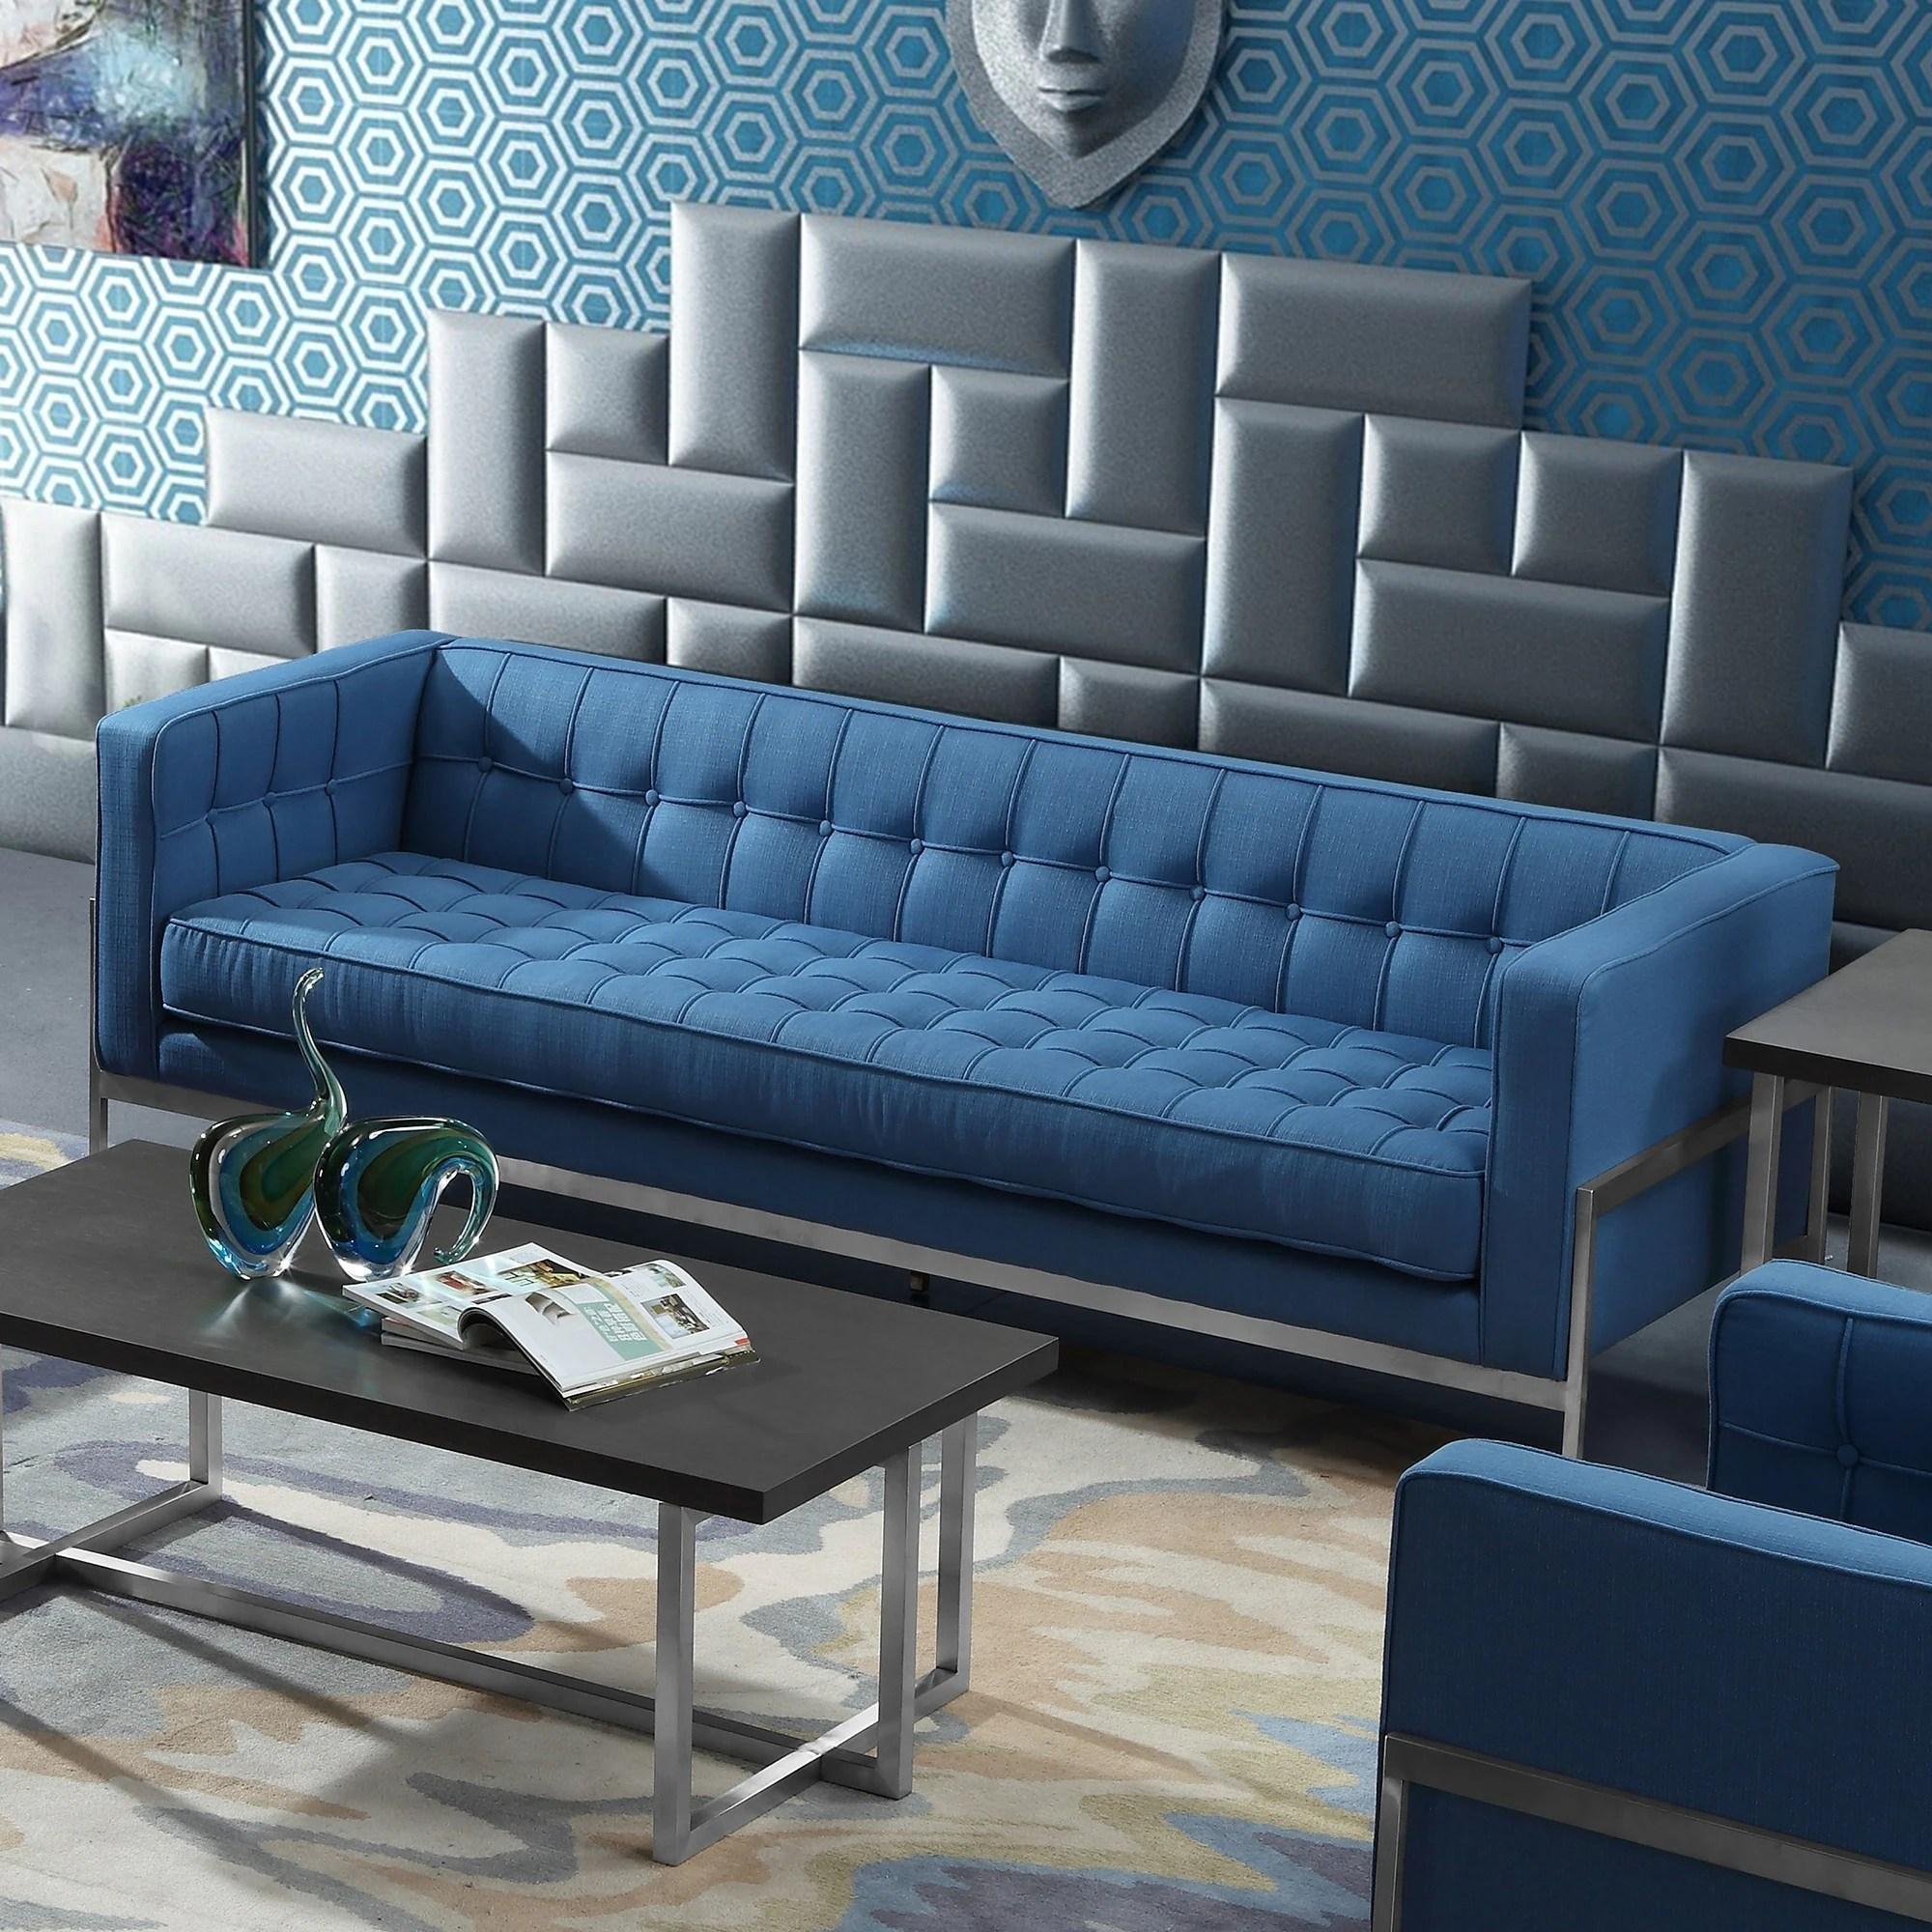 andre sofa beds san jose  home decor 88